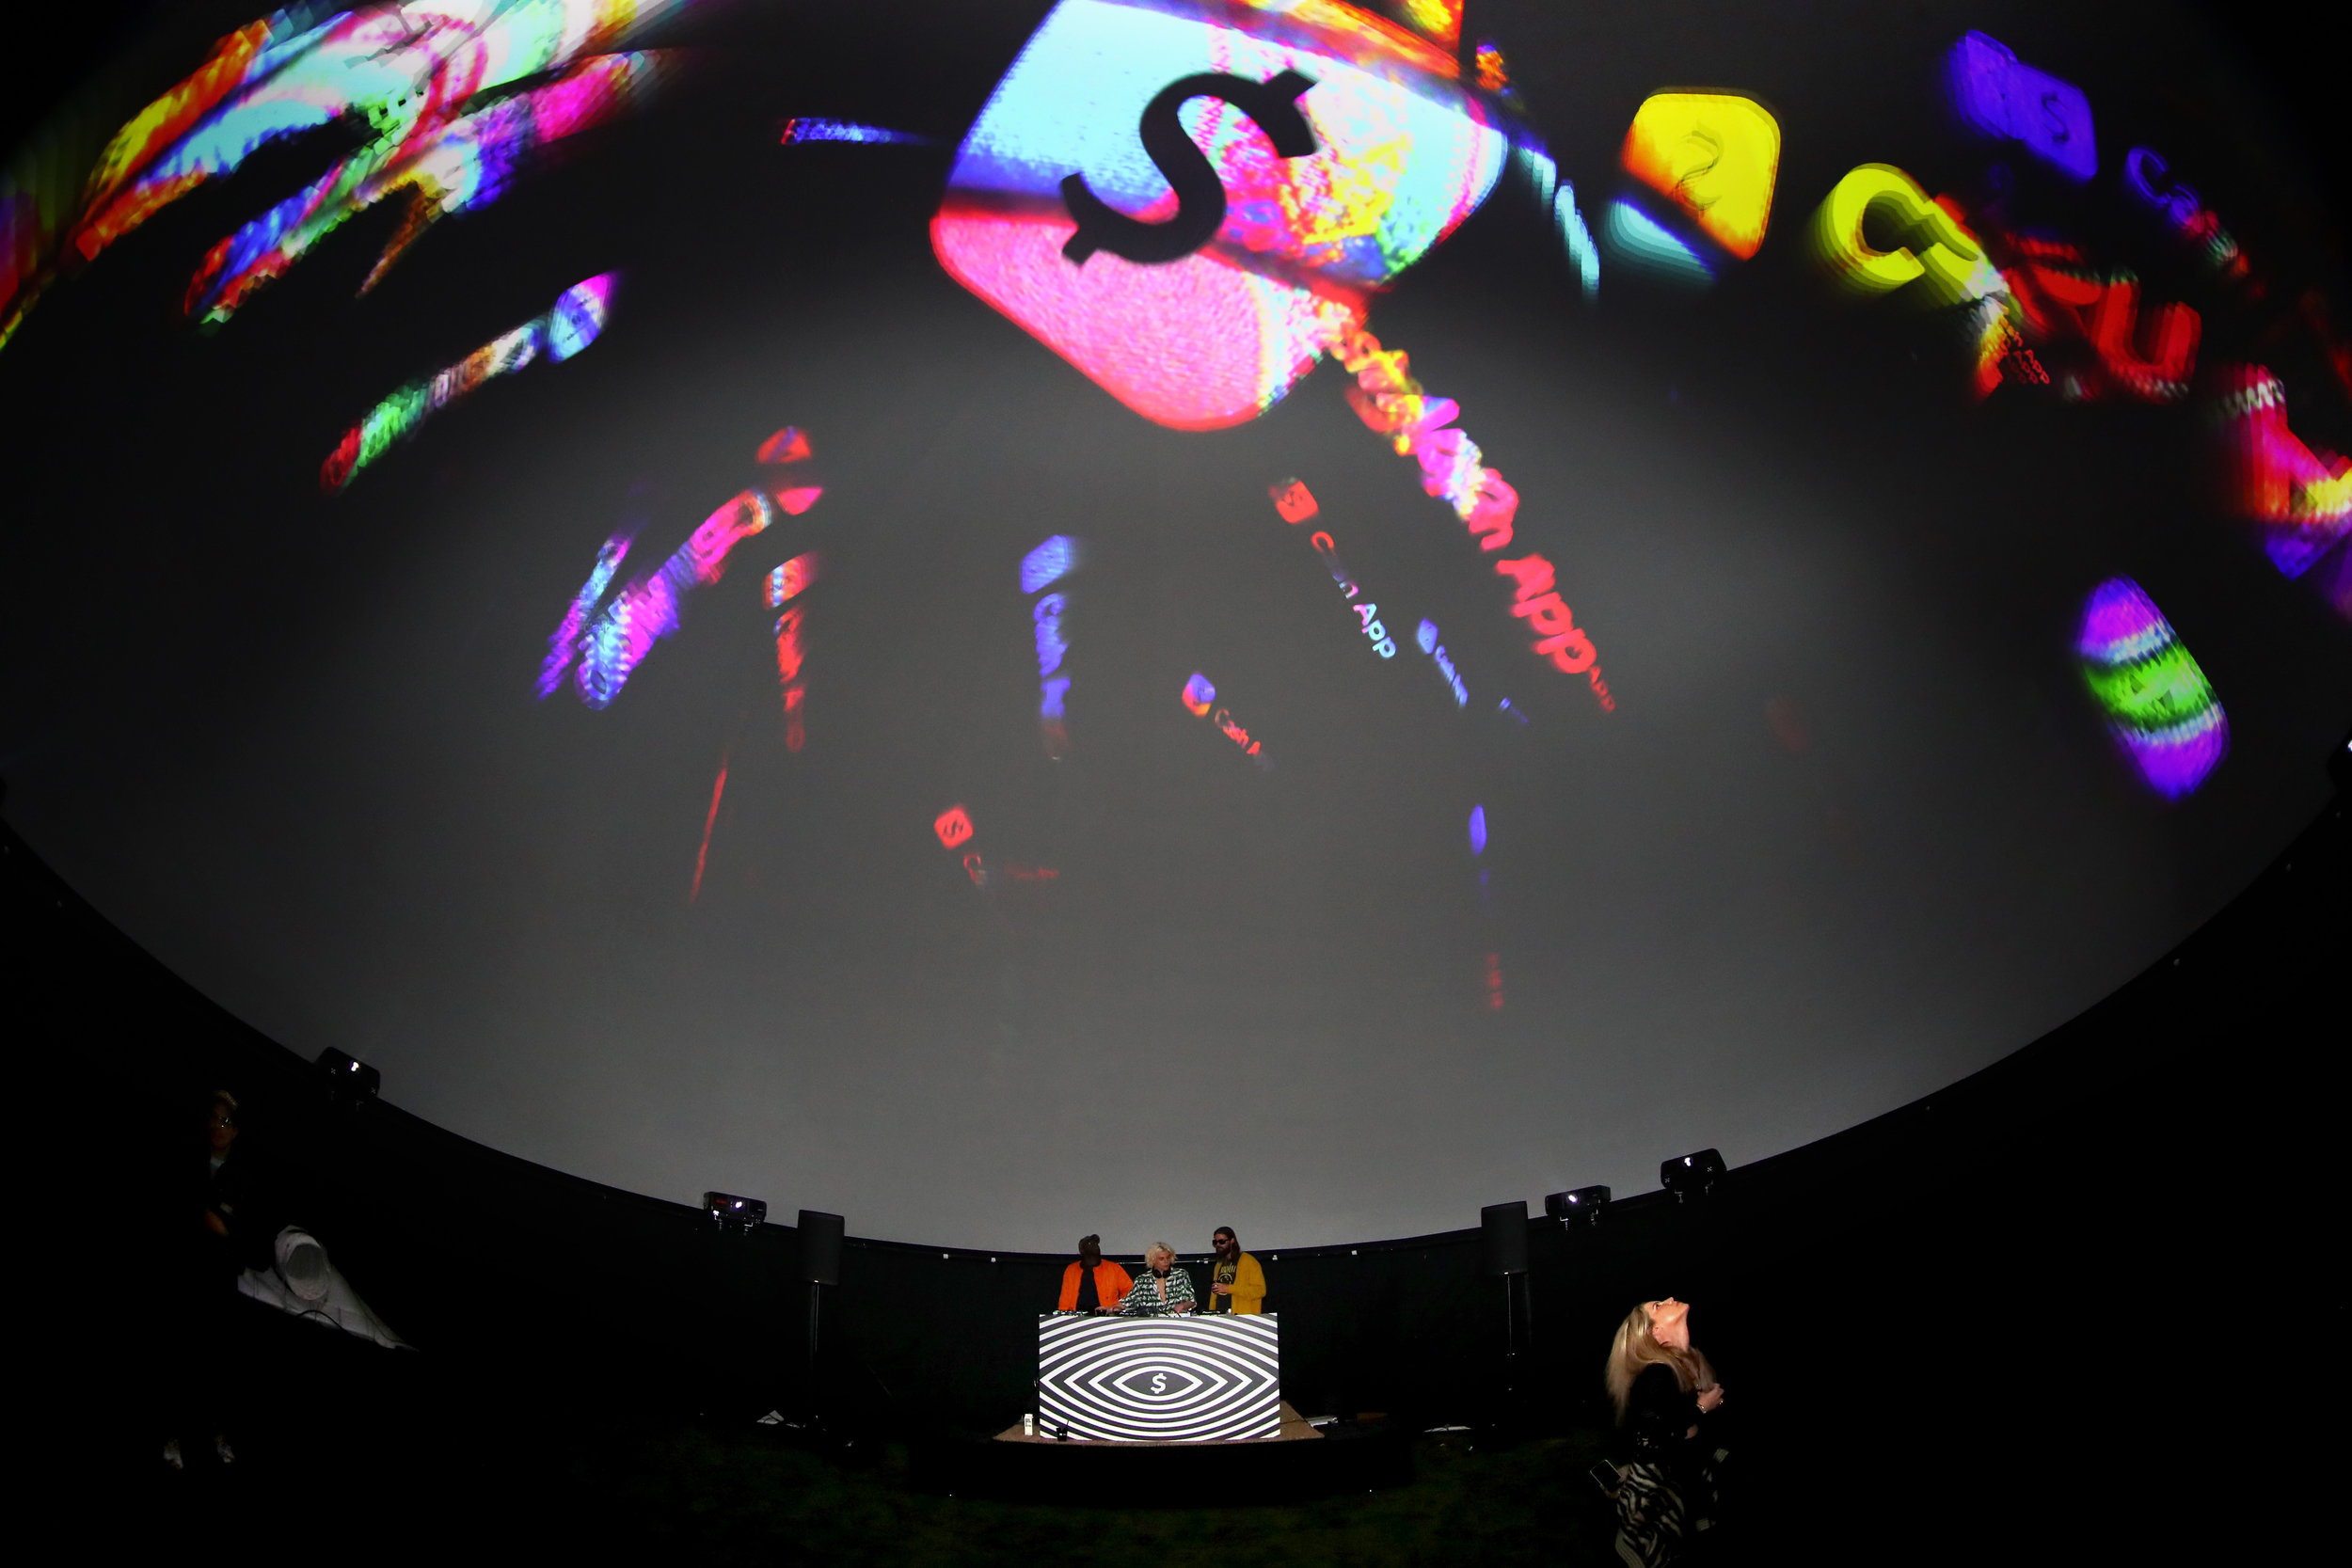 Cash App Celebrates Coachella with the Cash App Dome